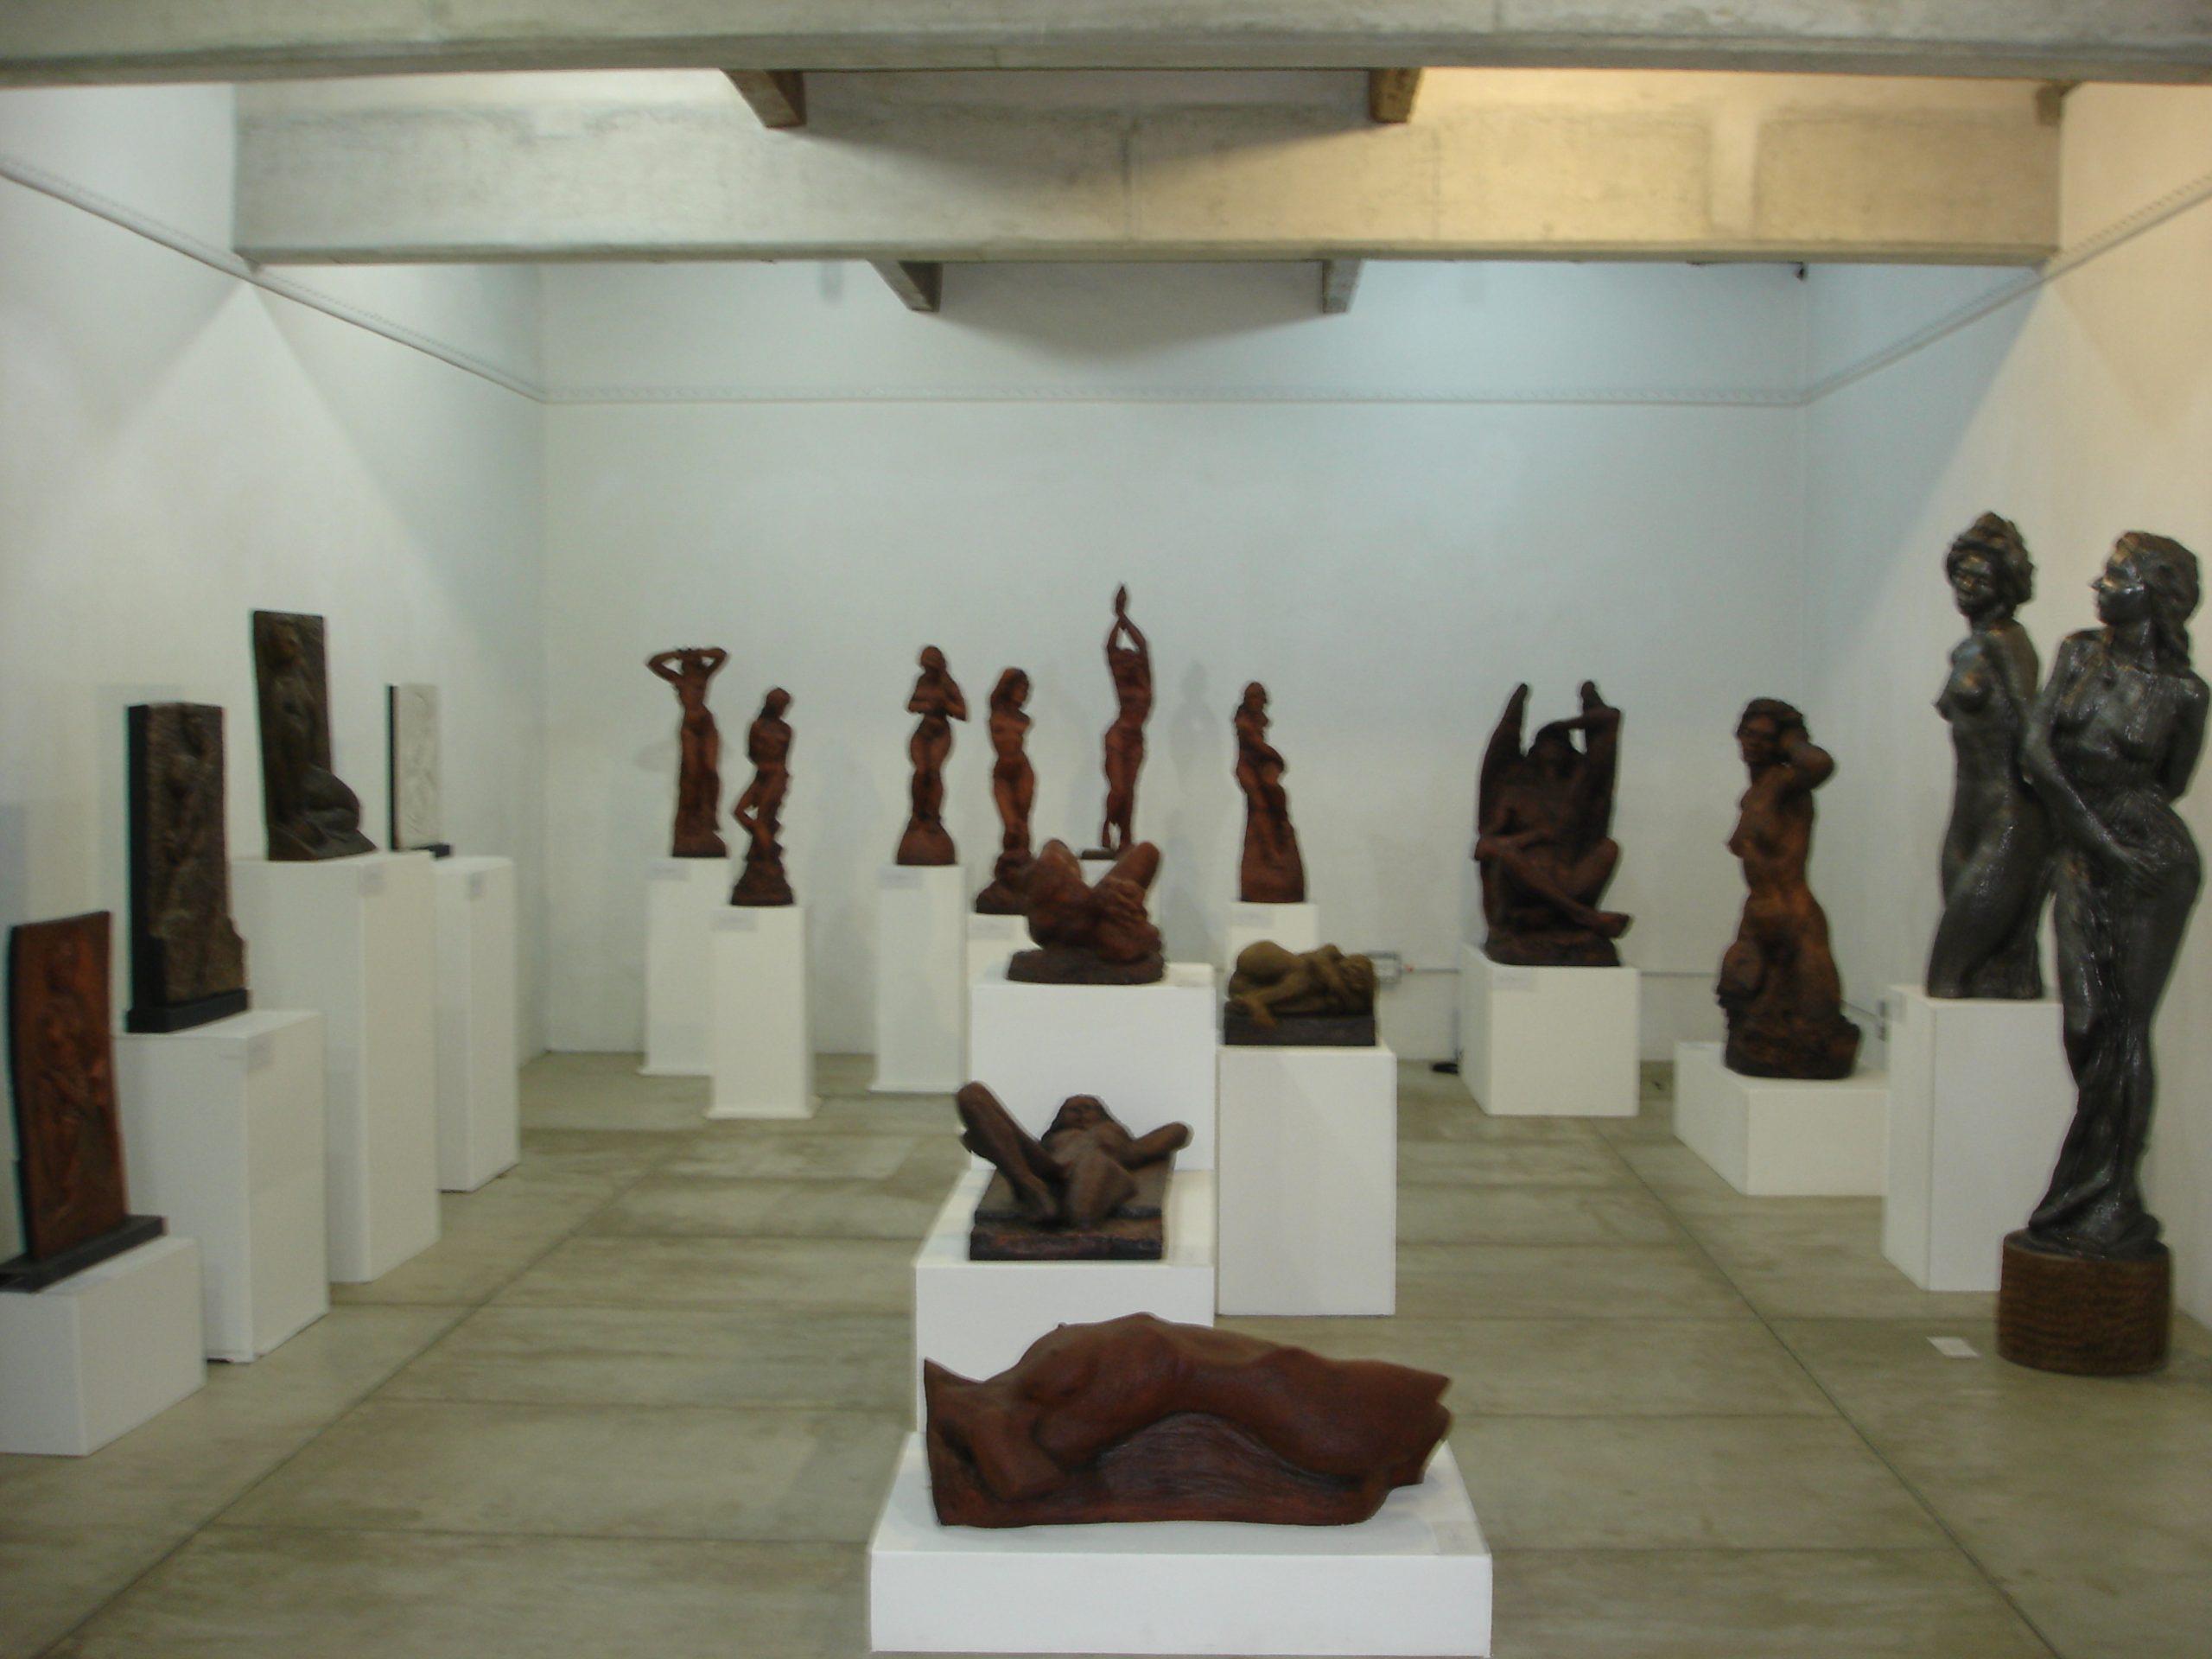 Historia Artistica Miguel Ángel Betancur T. Escultor 31